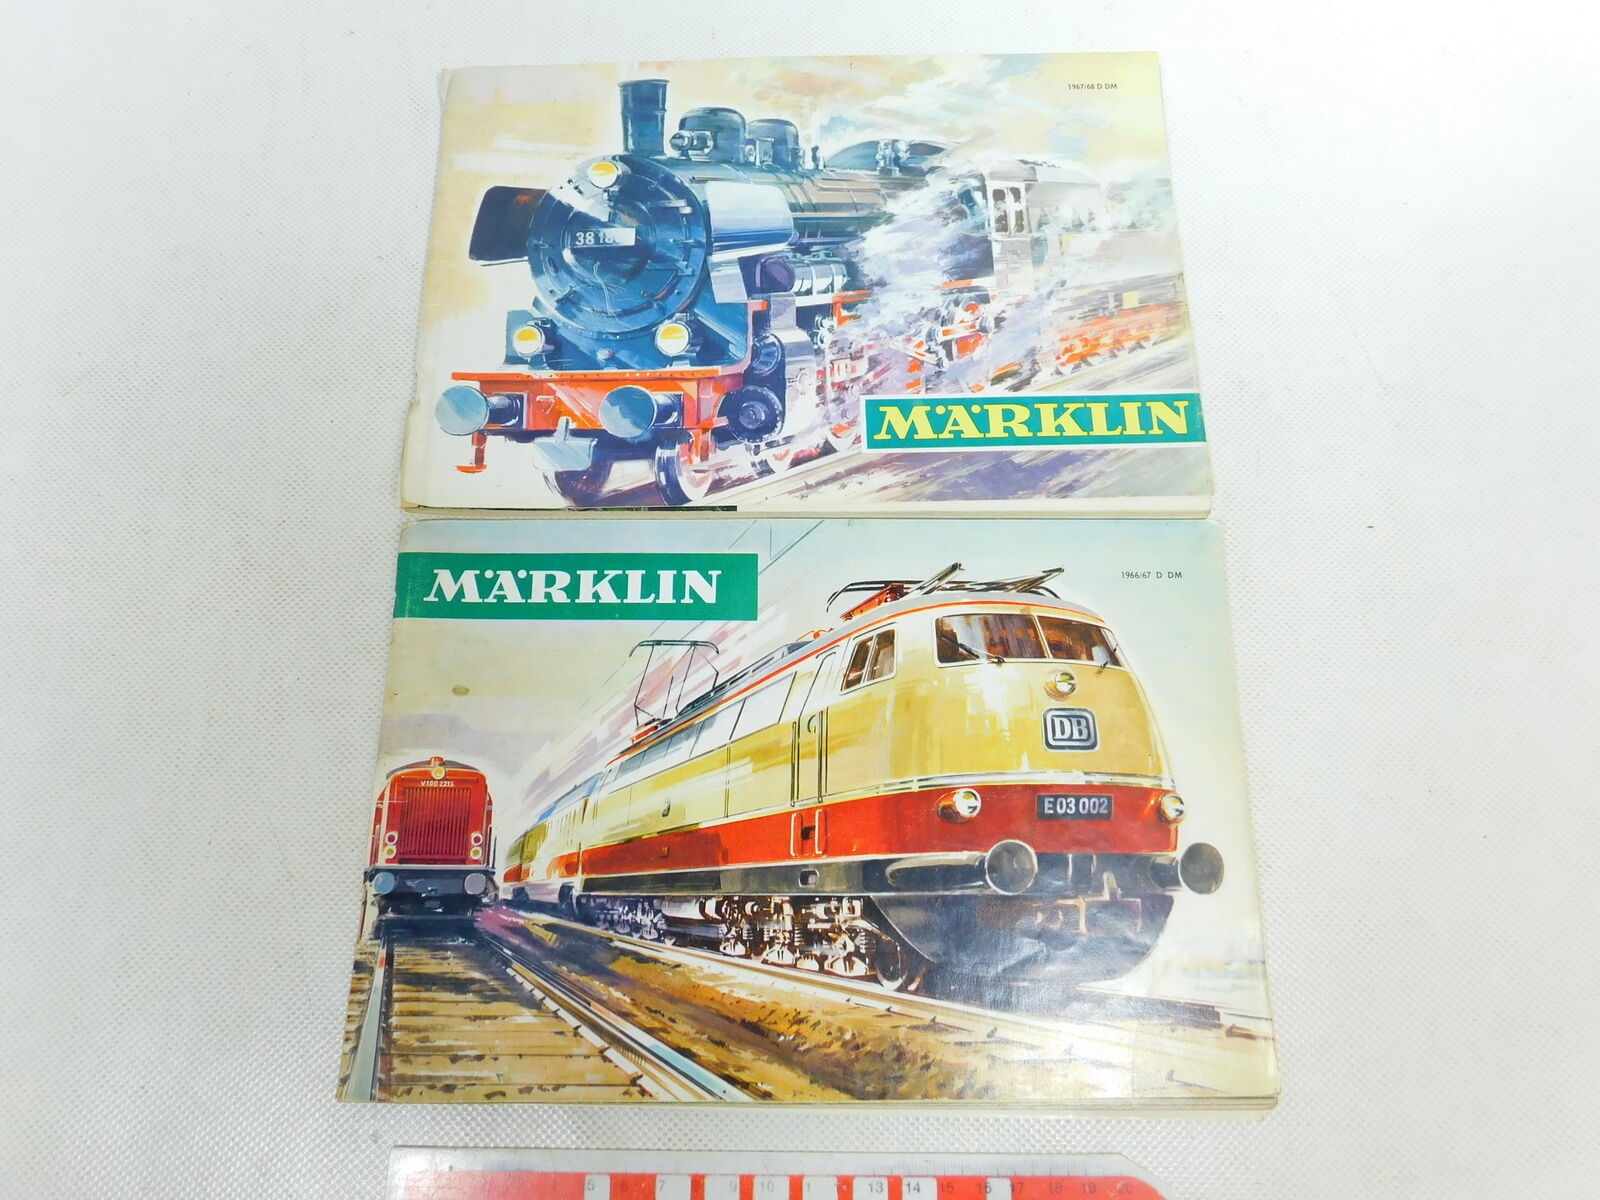 BW306-0,5x Märklin H0 Katalog ohne Gutschein  1966 67 D DM + 1967 68 D DM